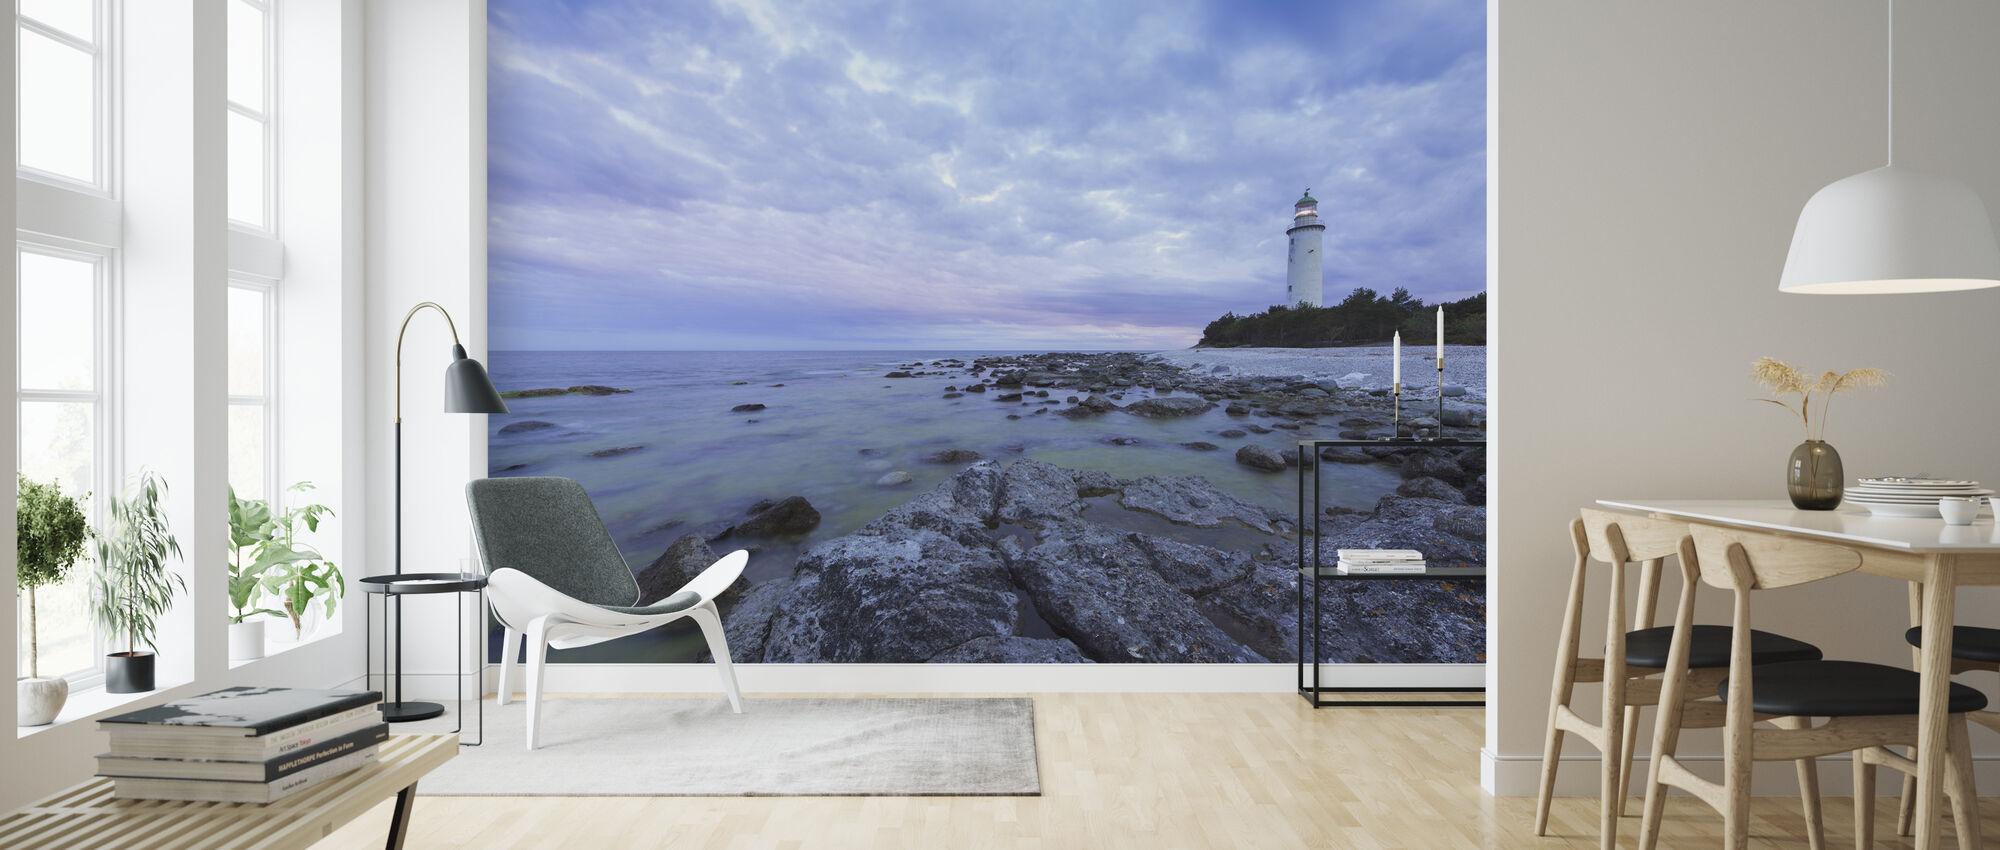 Lighthouse in Fårö, Gotland - Tapetti - Olohuone